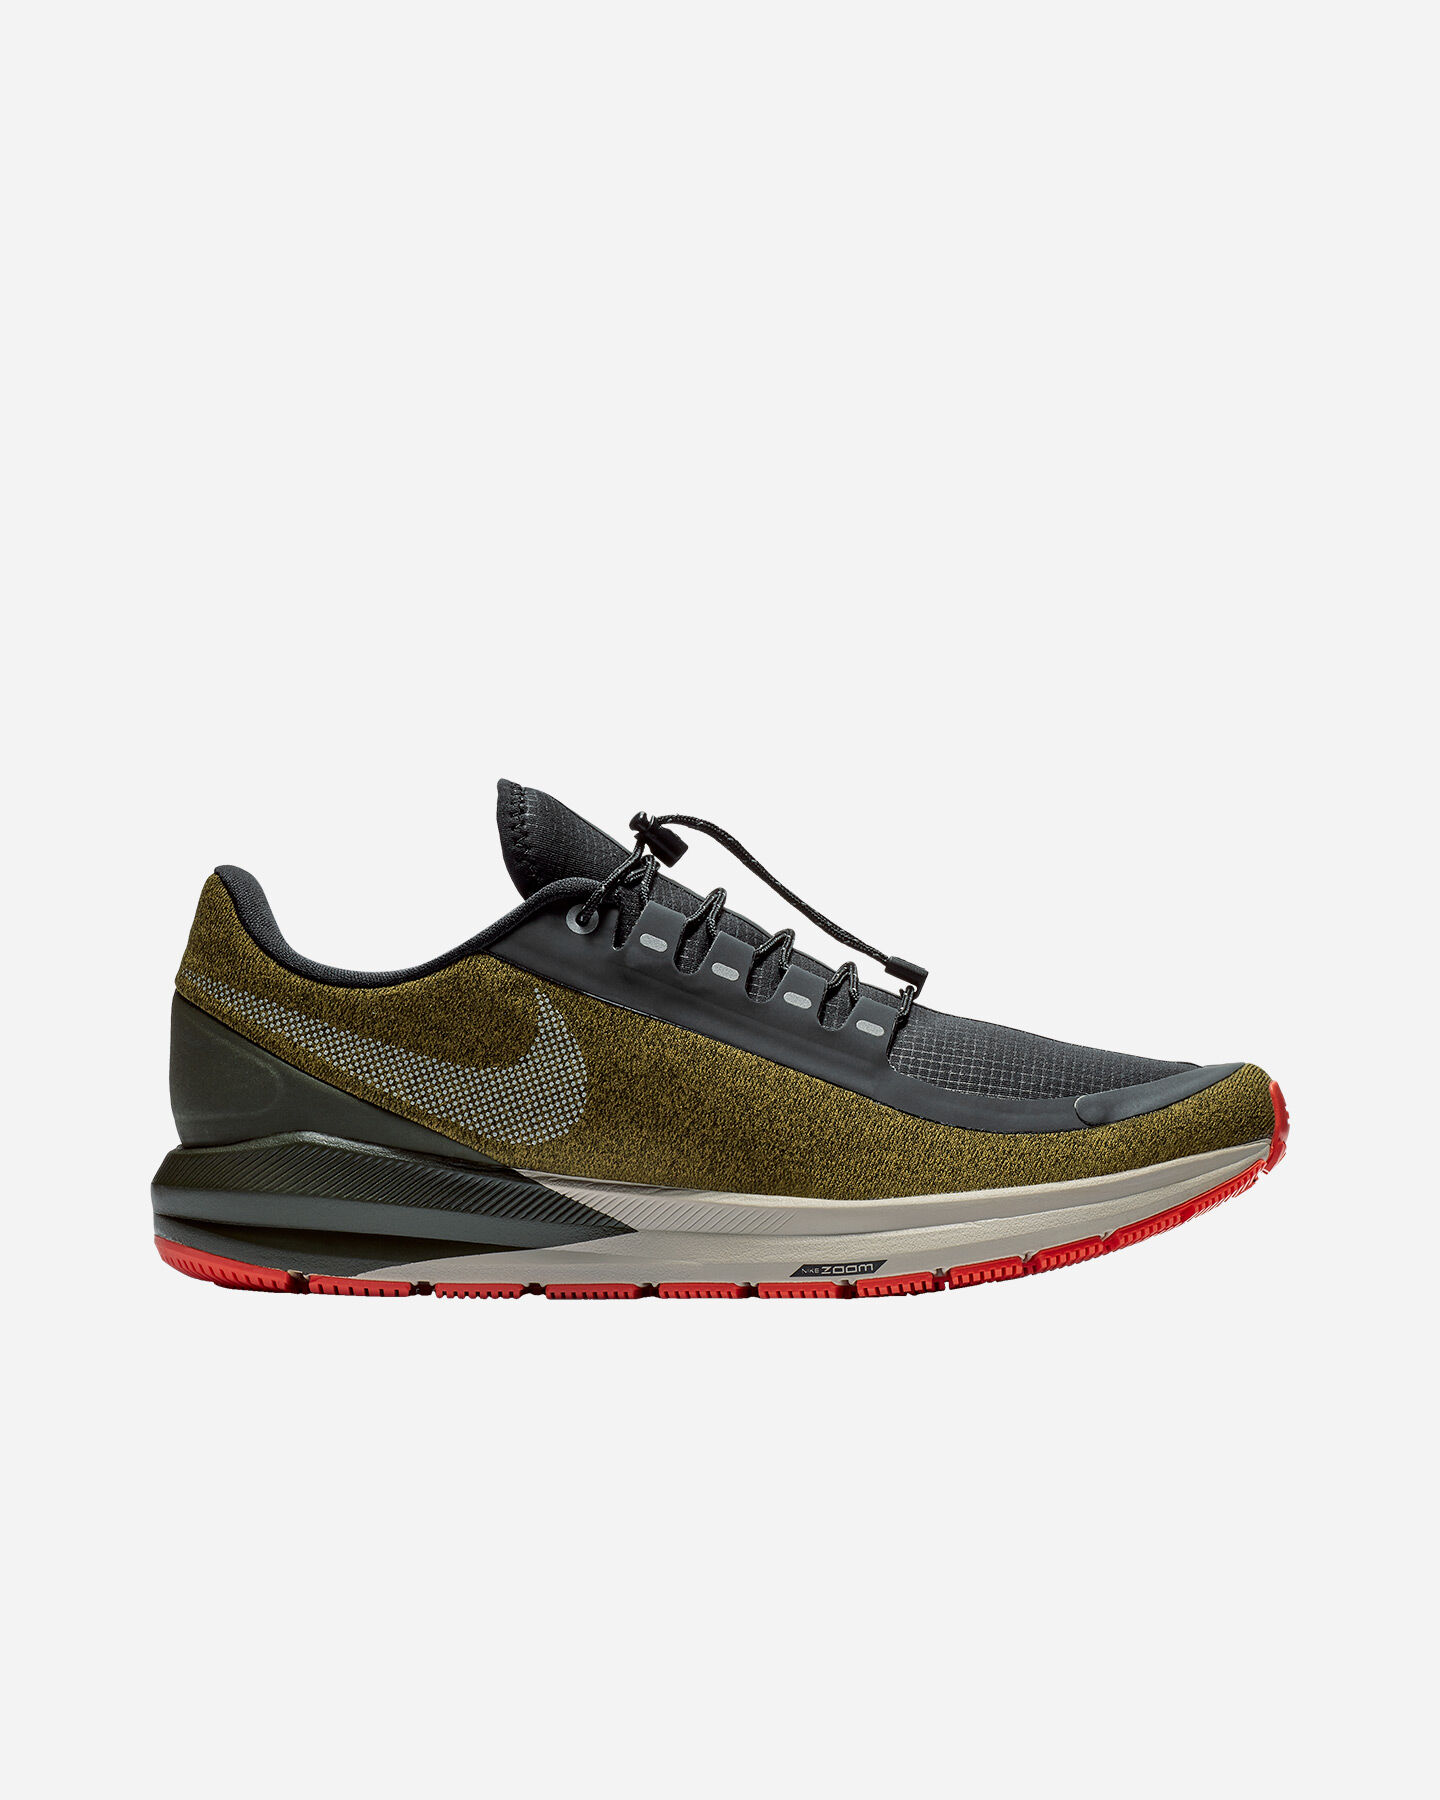 Scarpe Sport Abbigliamento Tute E X8u440w Nike Felpe Cisalfa 0vm8wNn